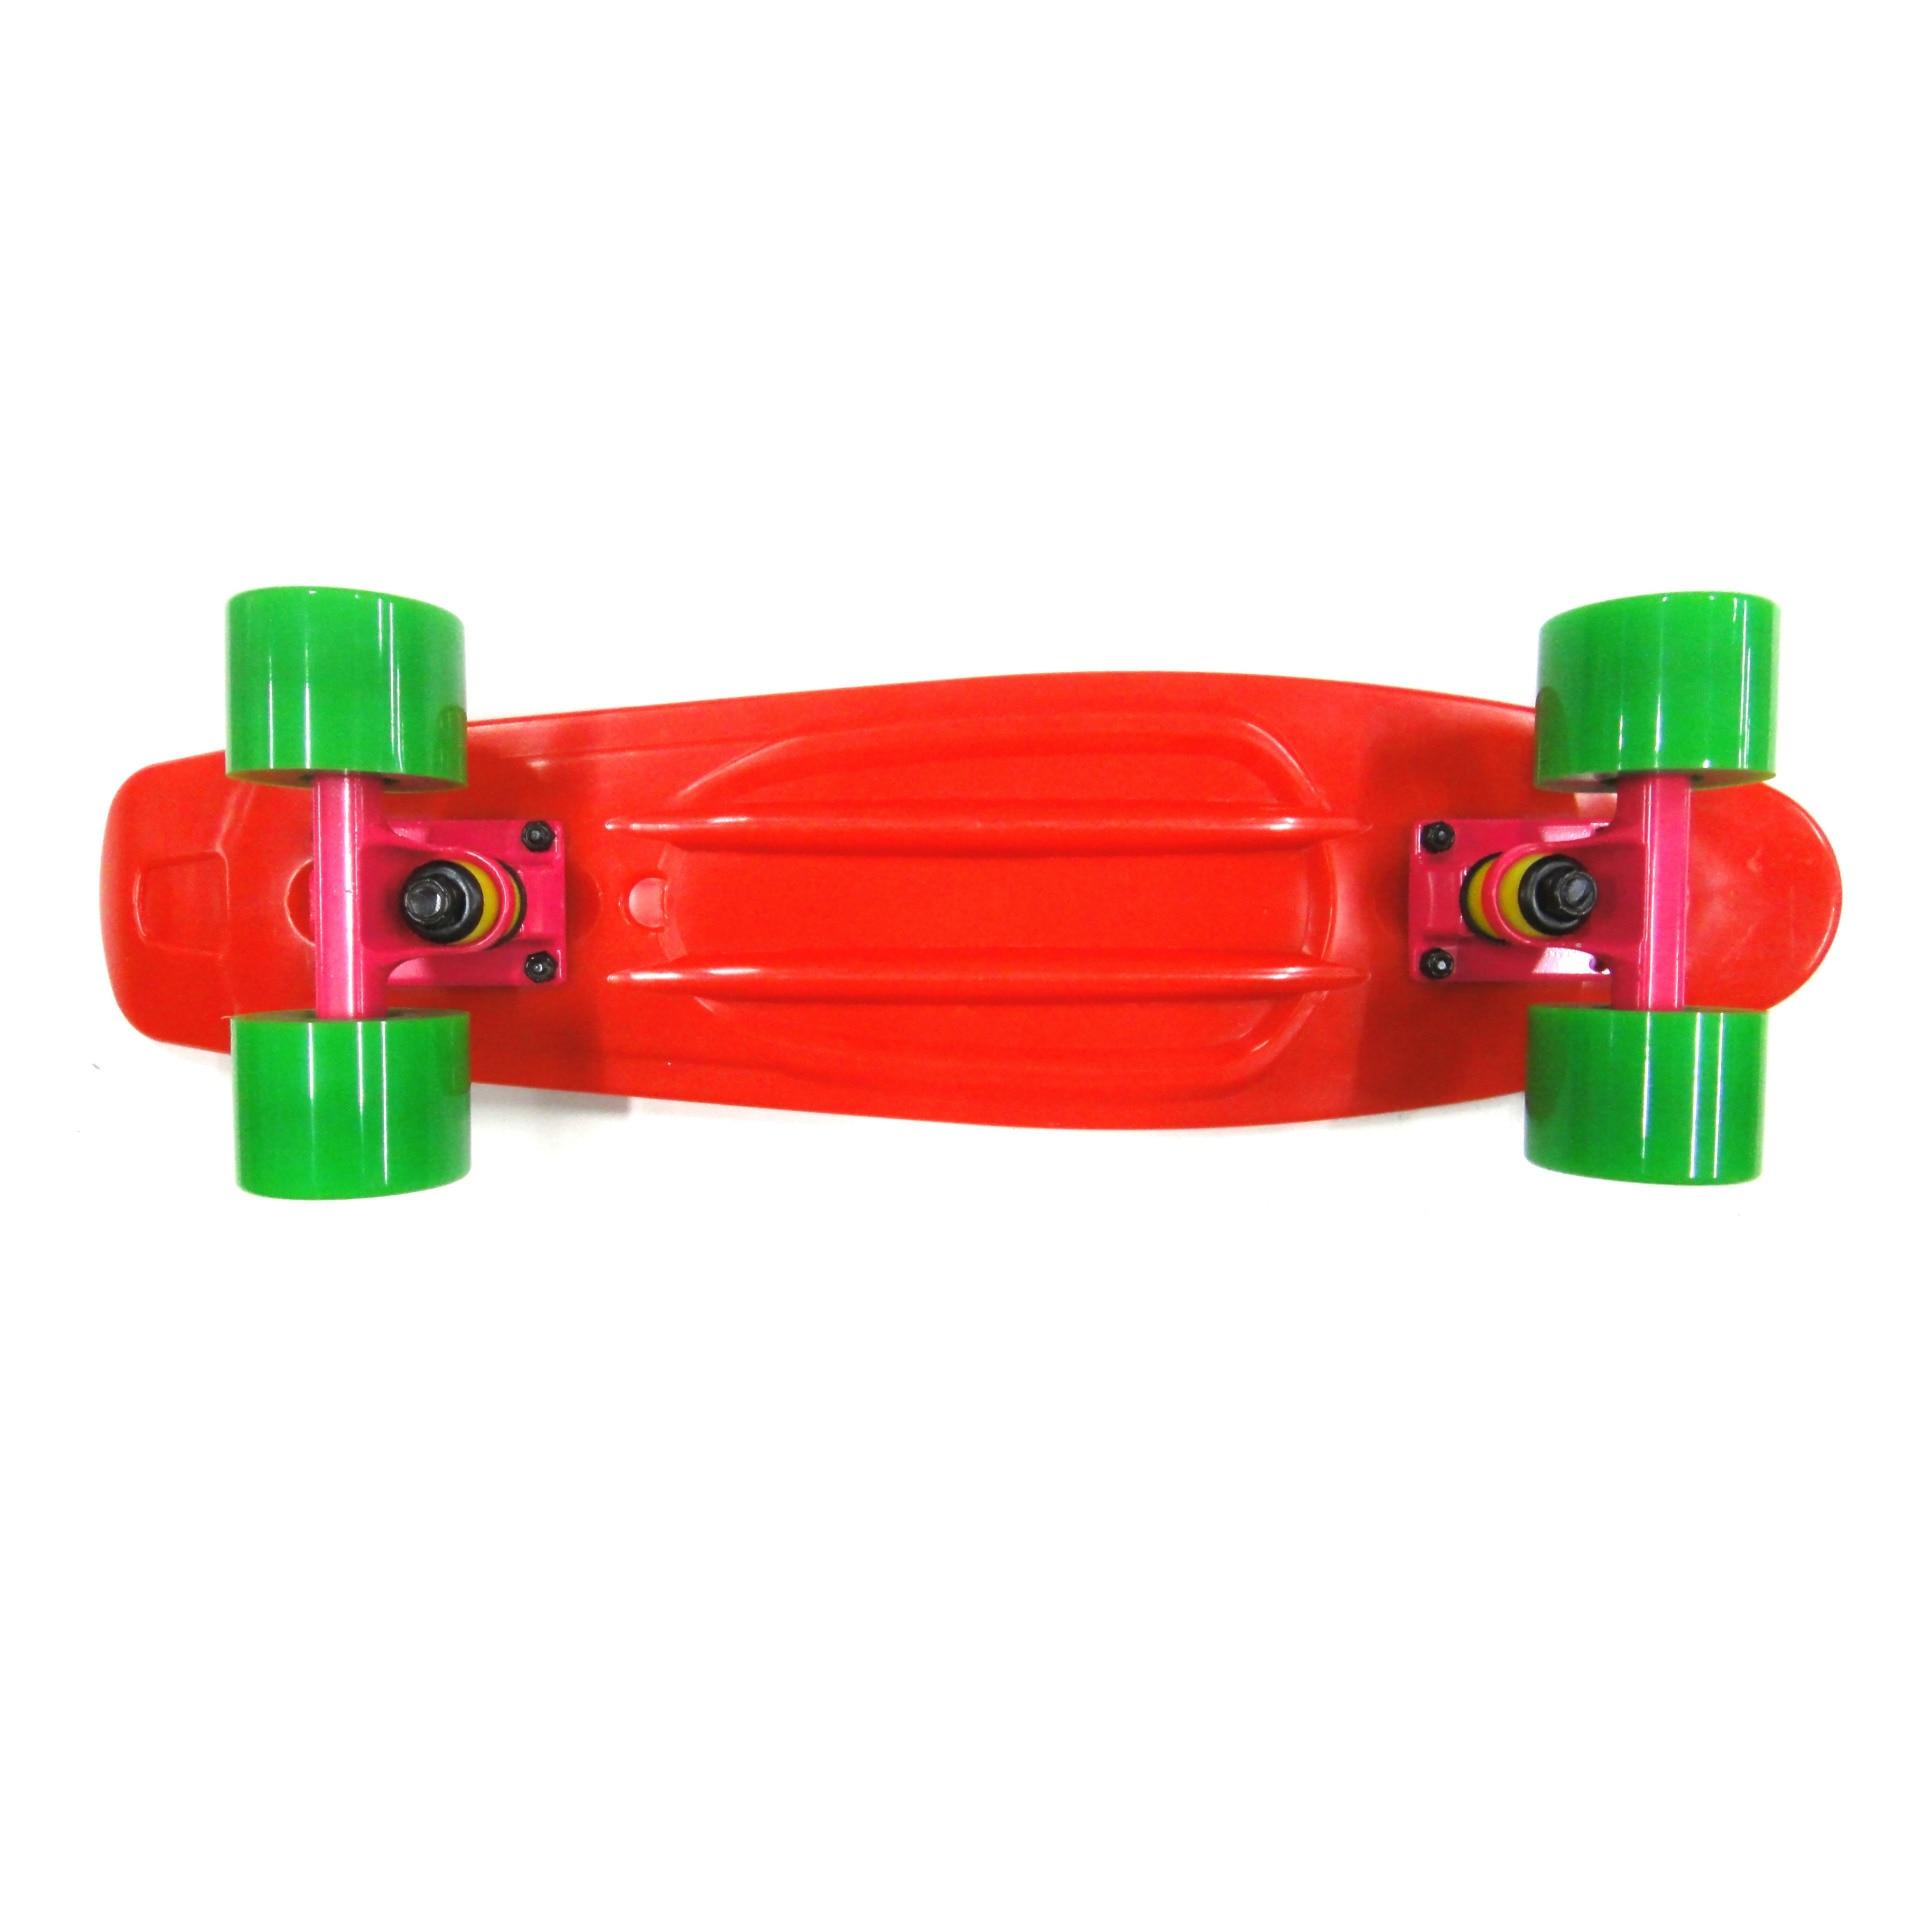 Manufacturers Supply Children's Skateboard Fish Skateboard Retro Color Skateboard Streamlined Exclusive For Children Skateboard